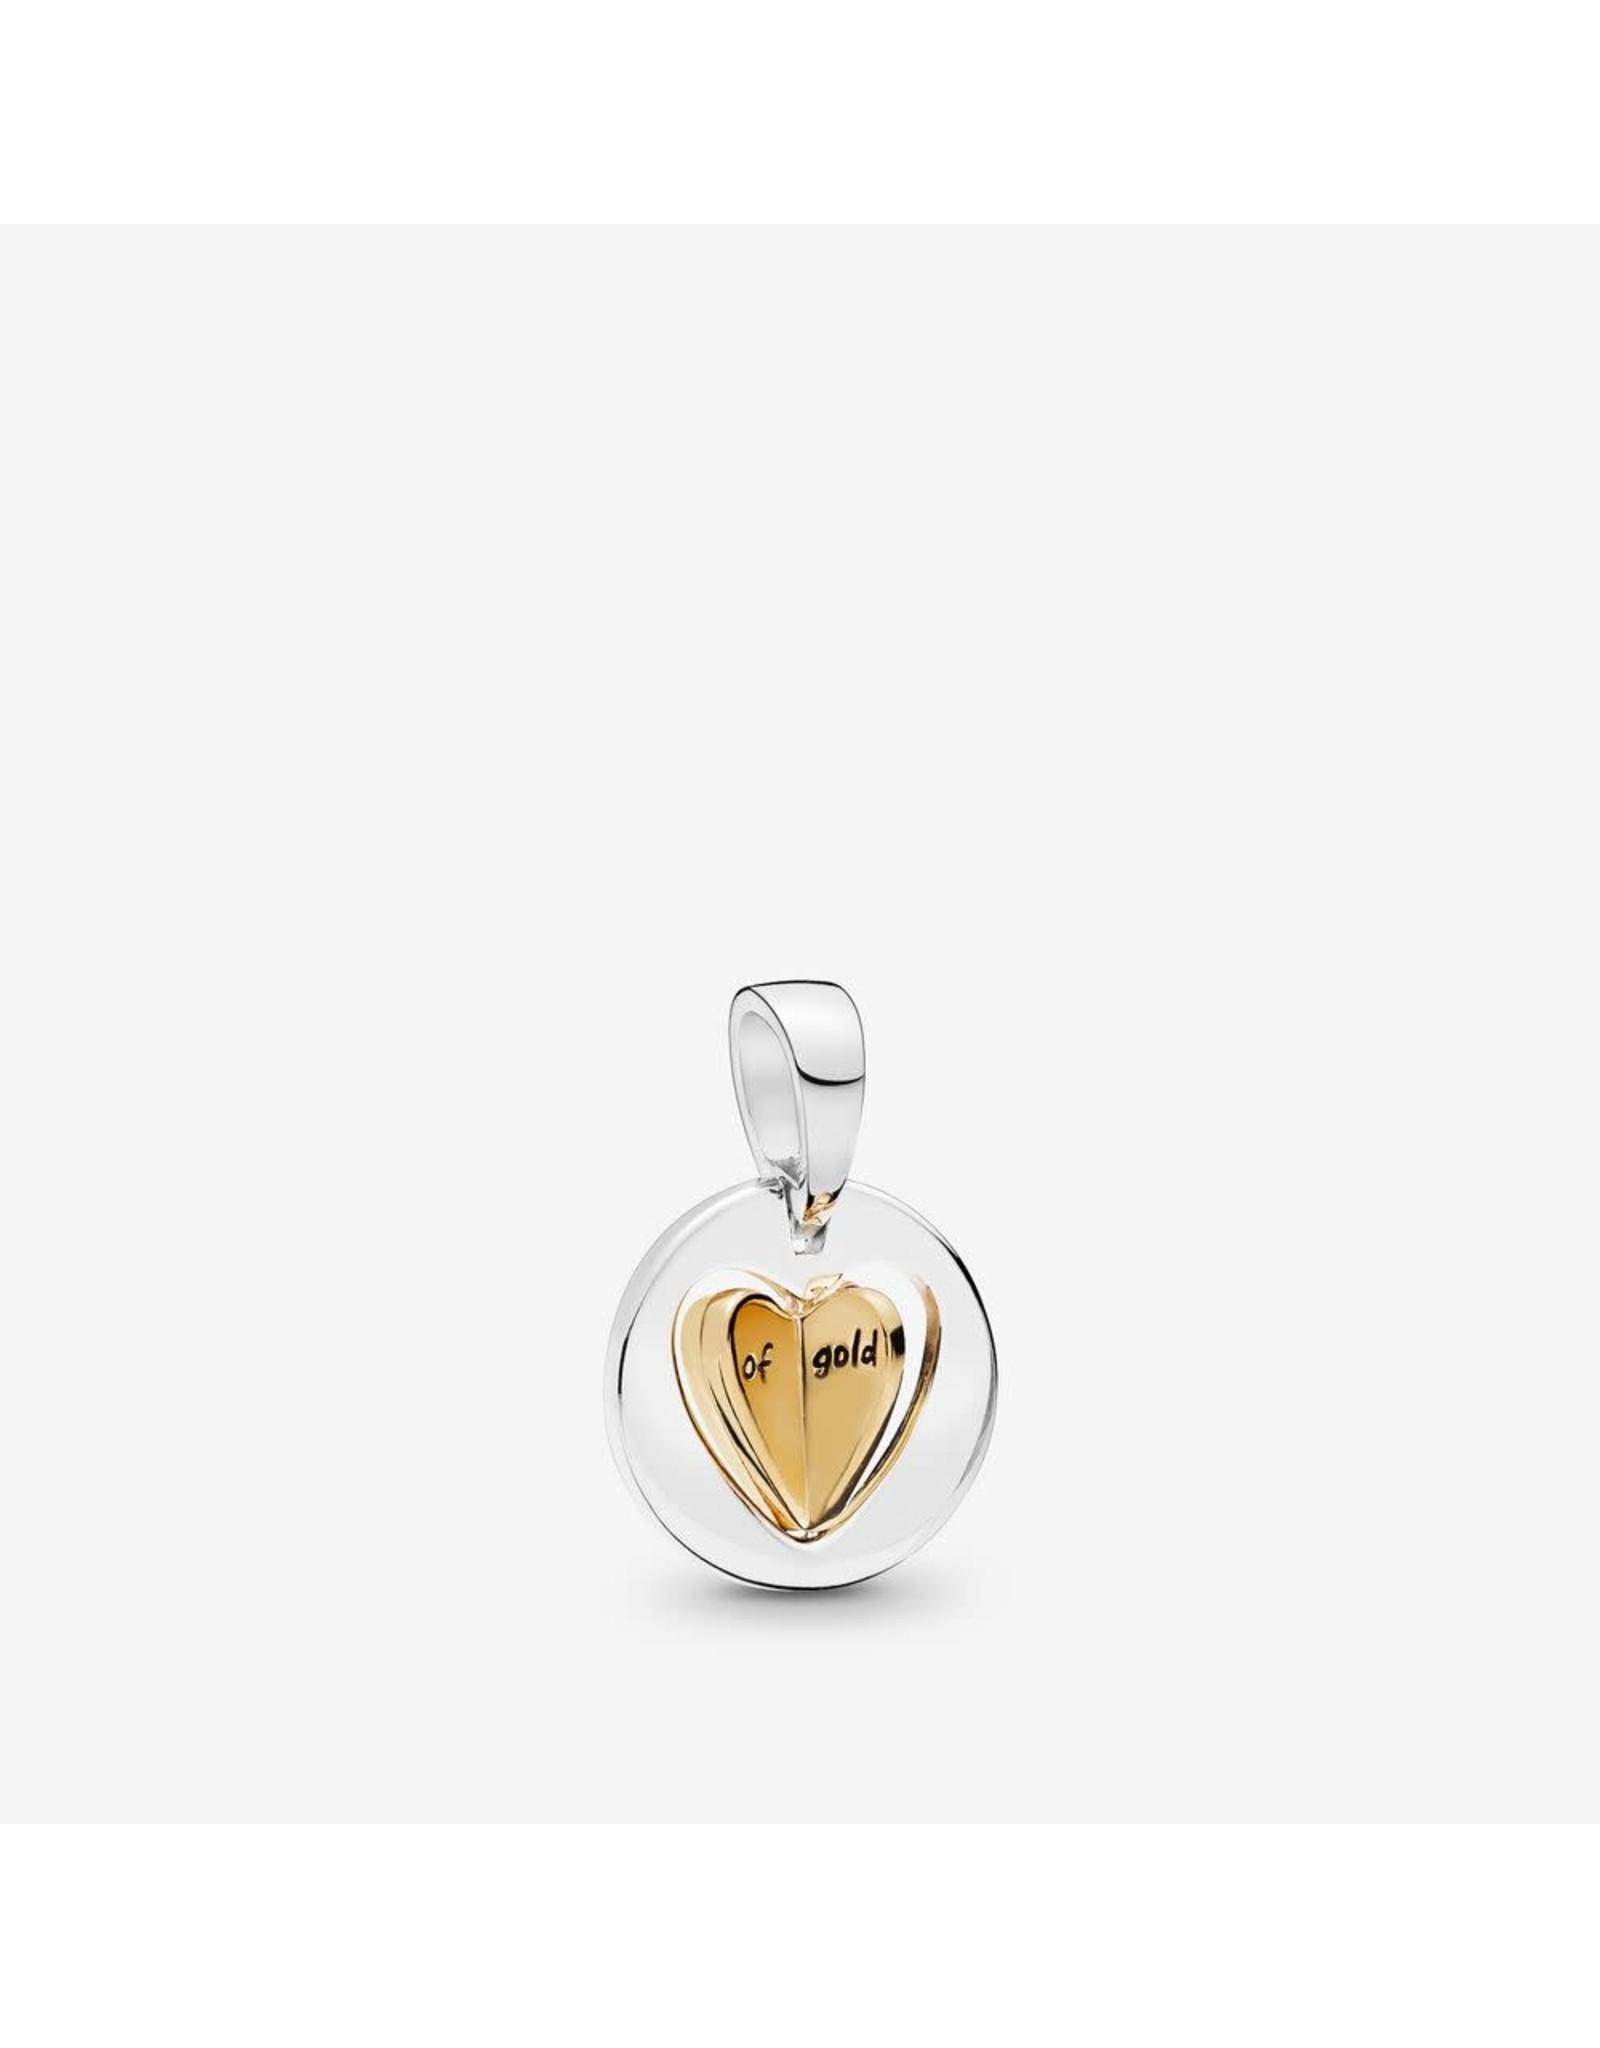 Pandora Pandora Charm768756C00, Mom's Golden Heart